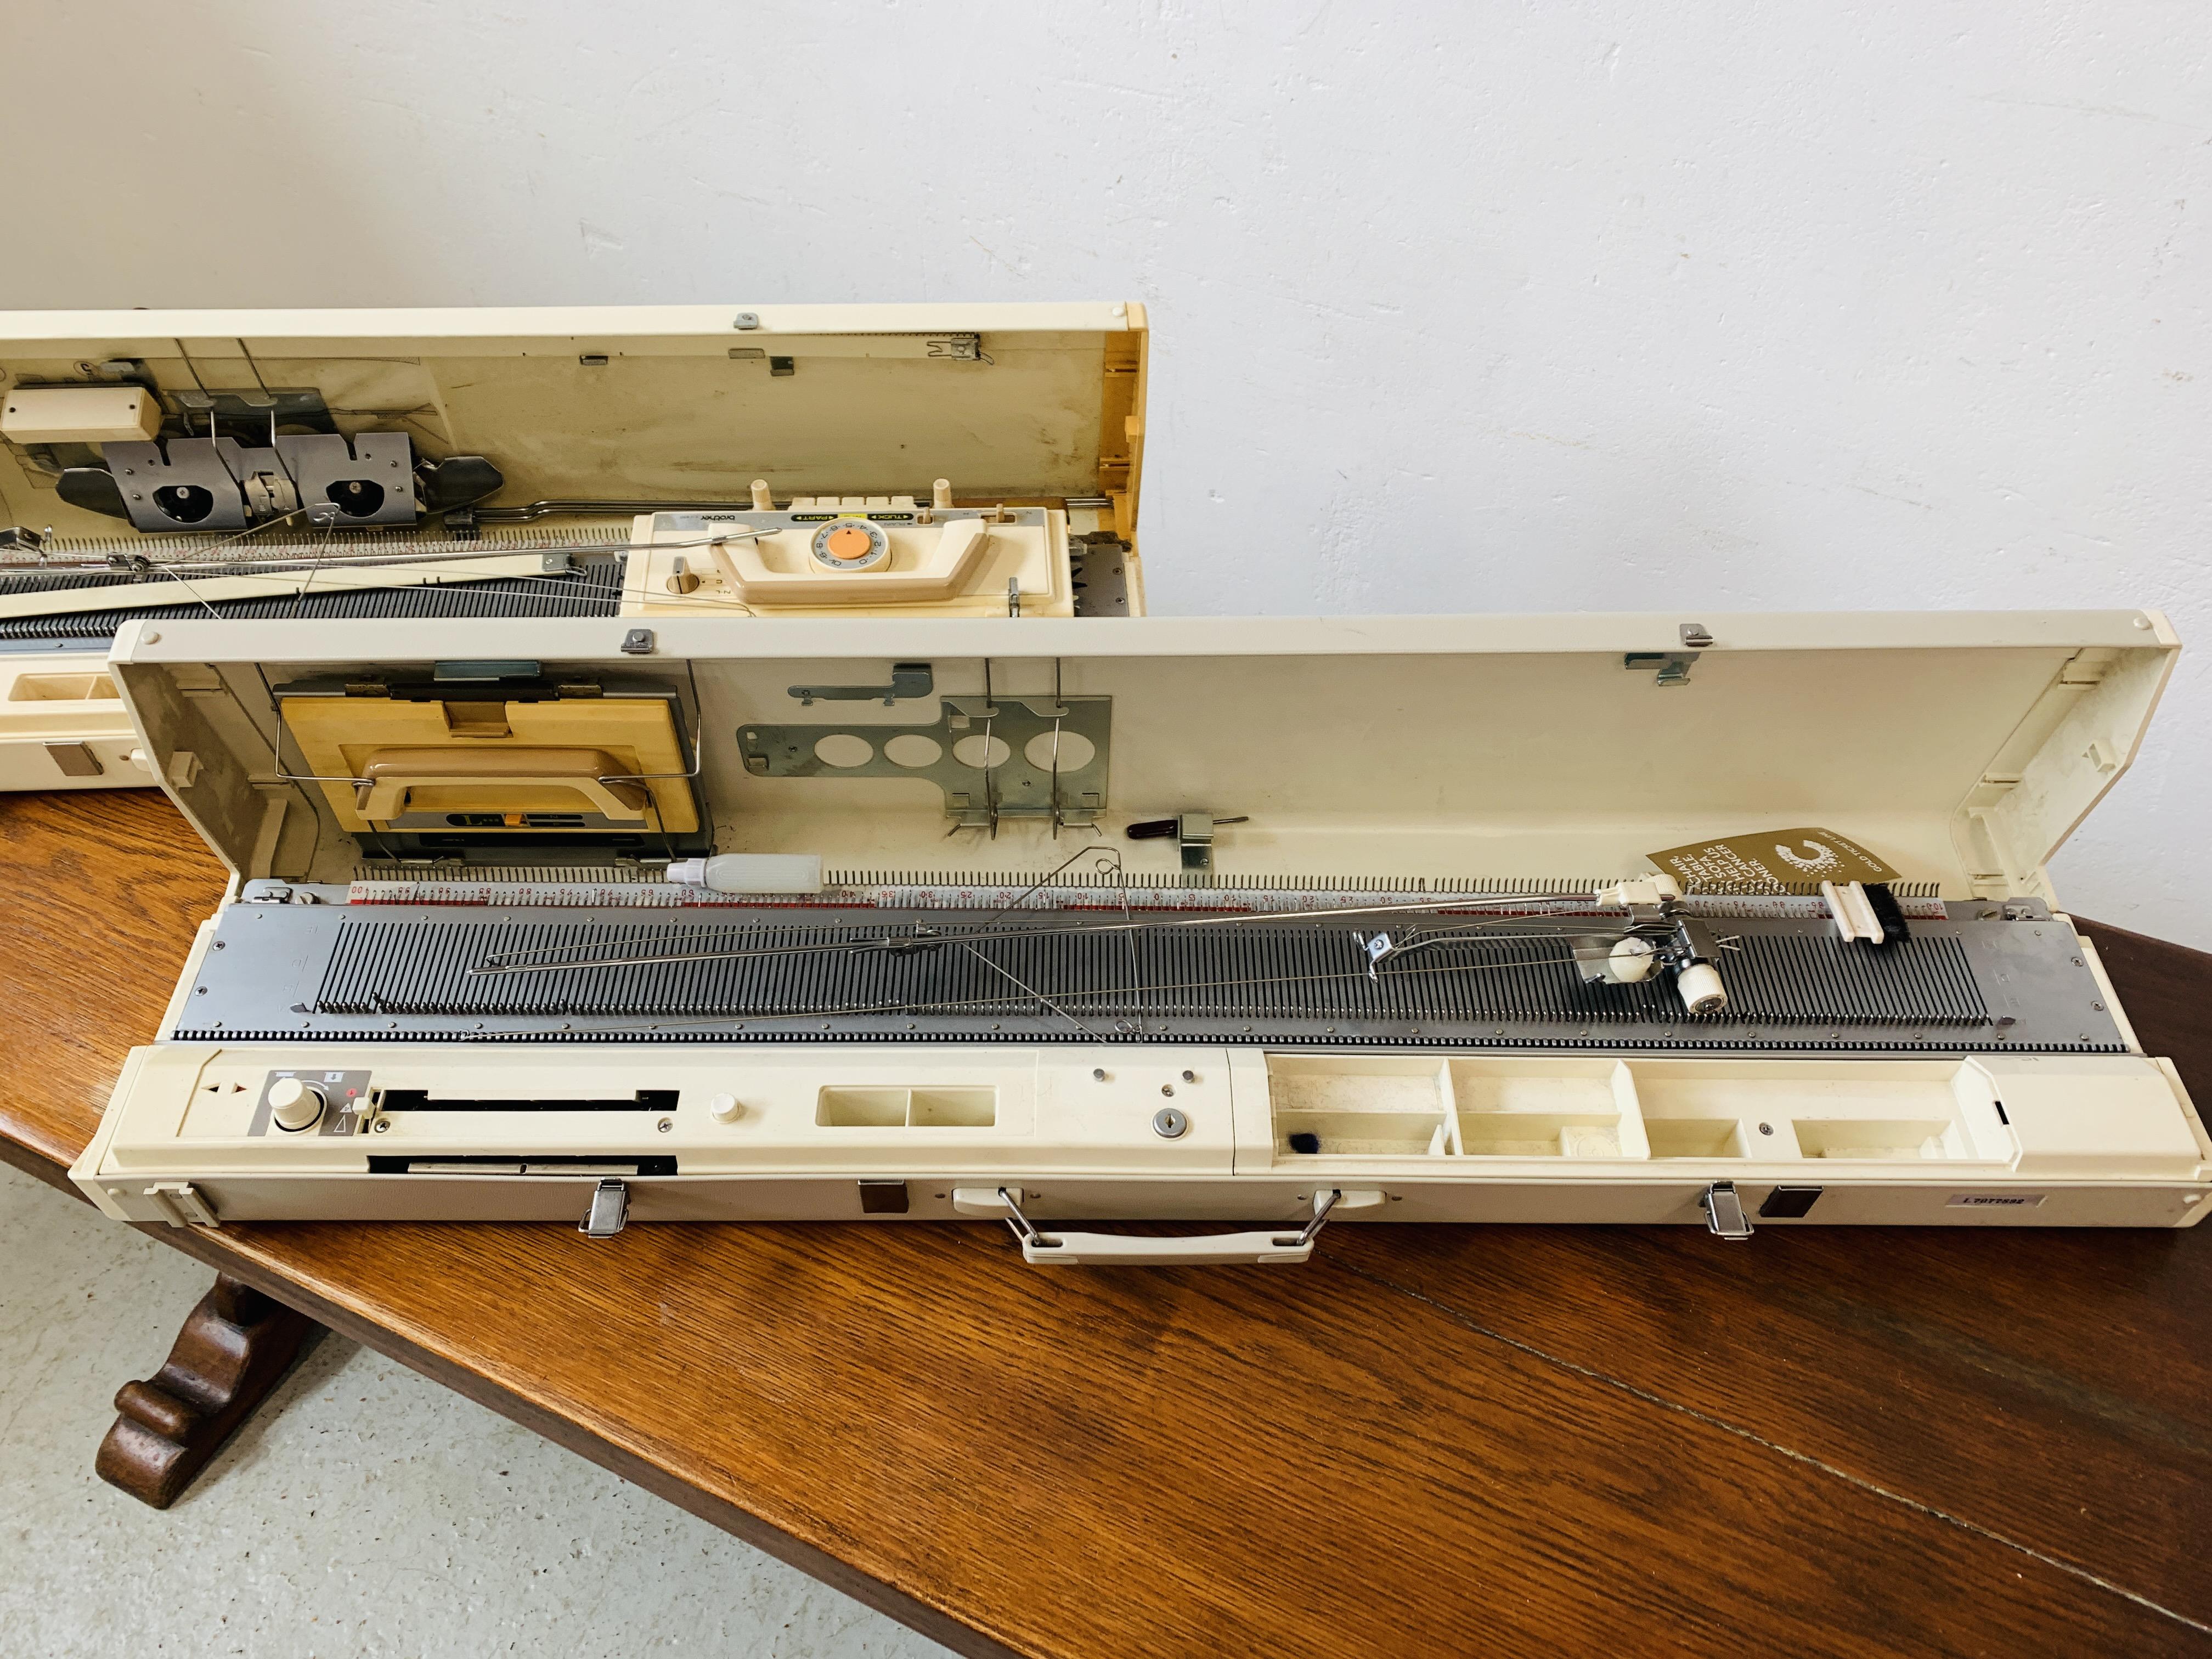 BROTHER KNITTING MACHINE KH - 830 + BROTHER KNITTING MACHINE KH - 890. - Image 2 of 7